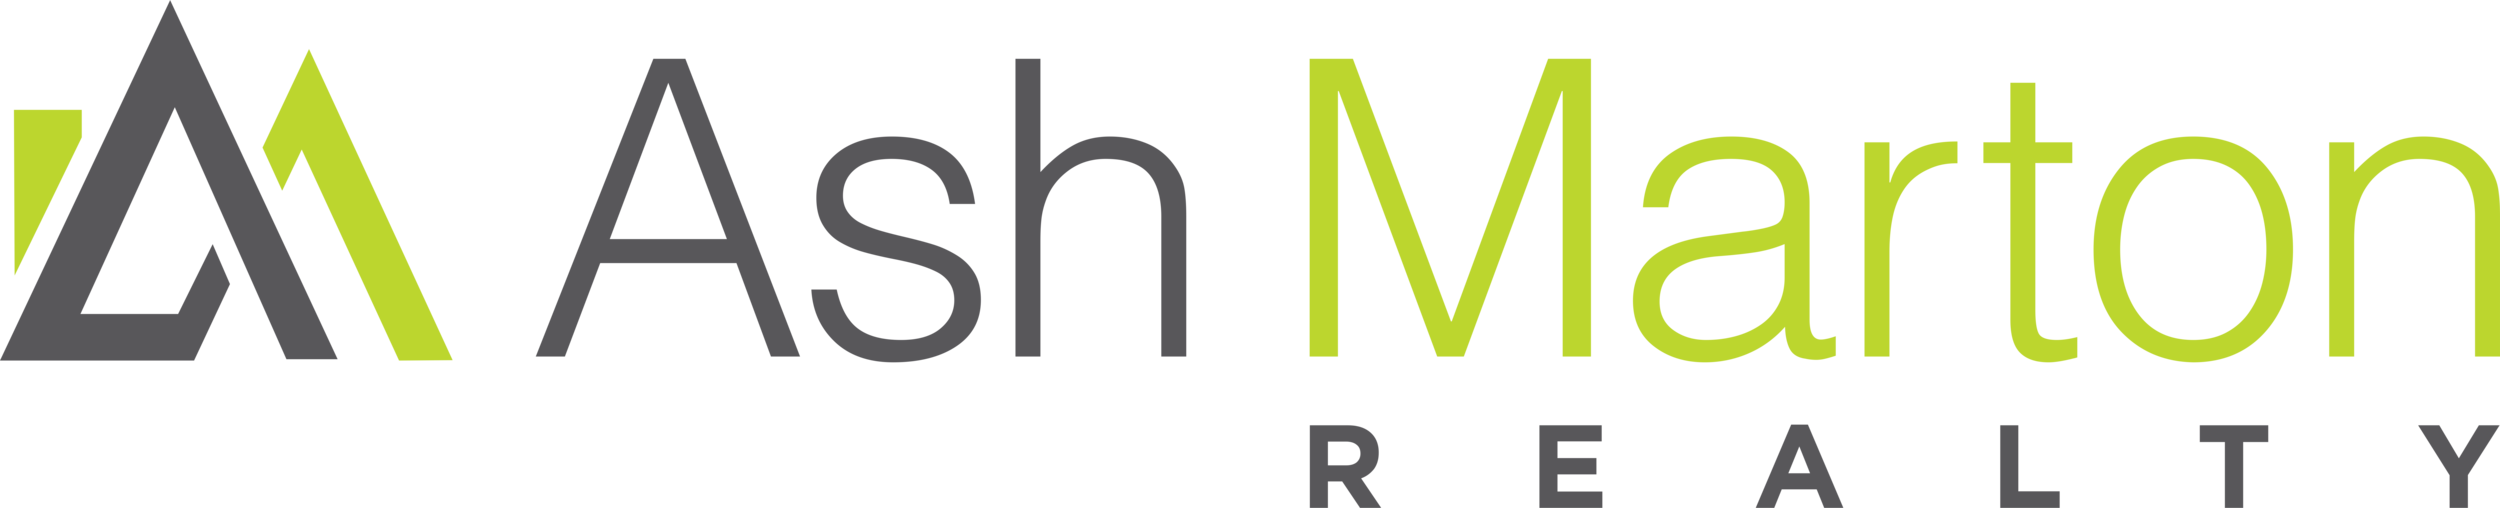 Logo Charcoal.png